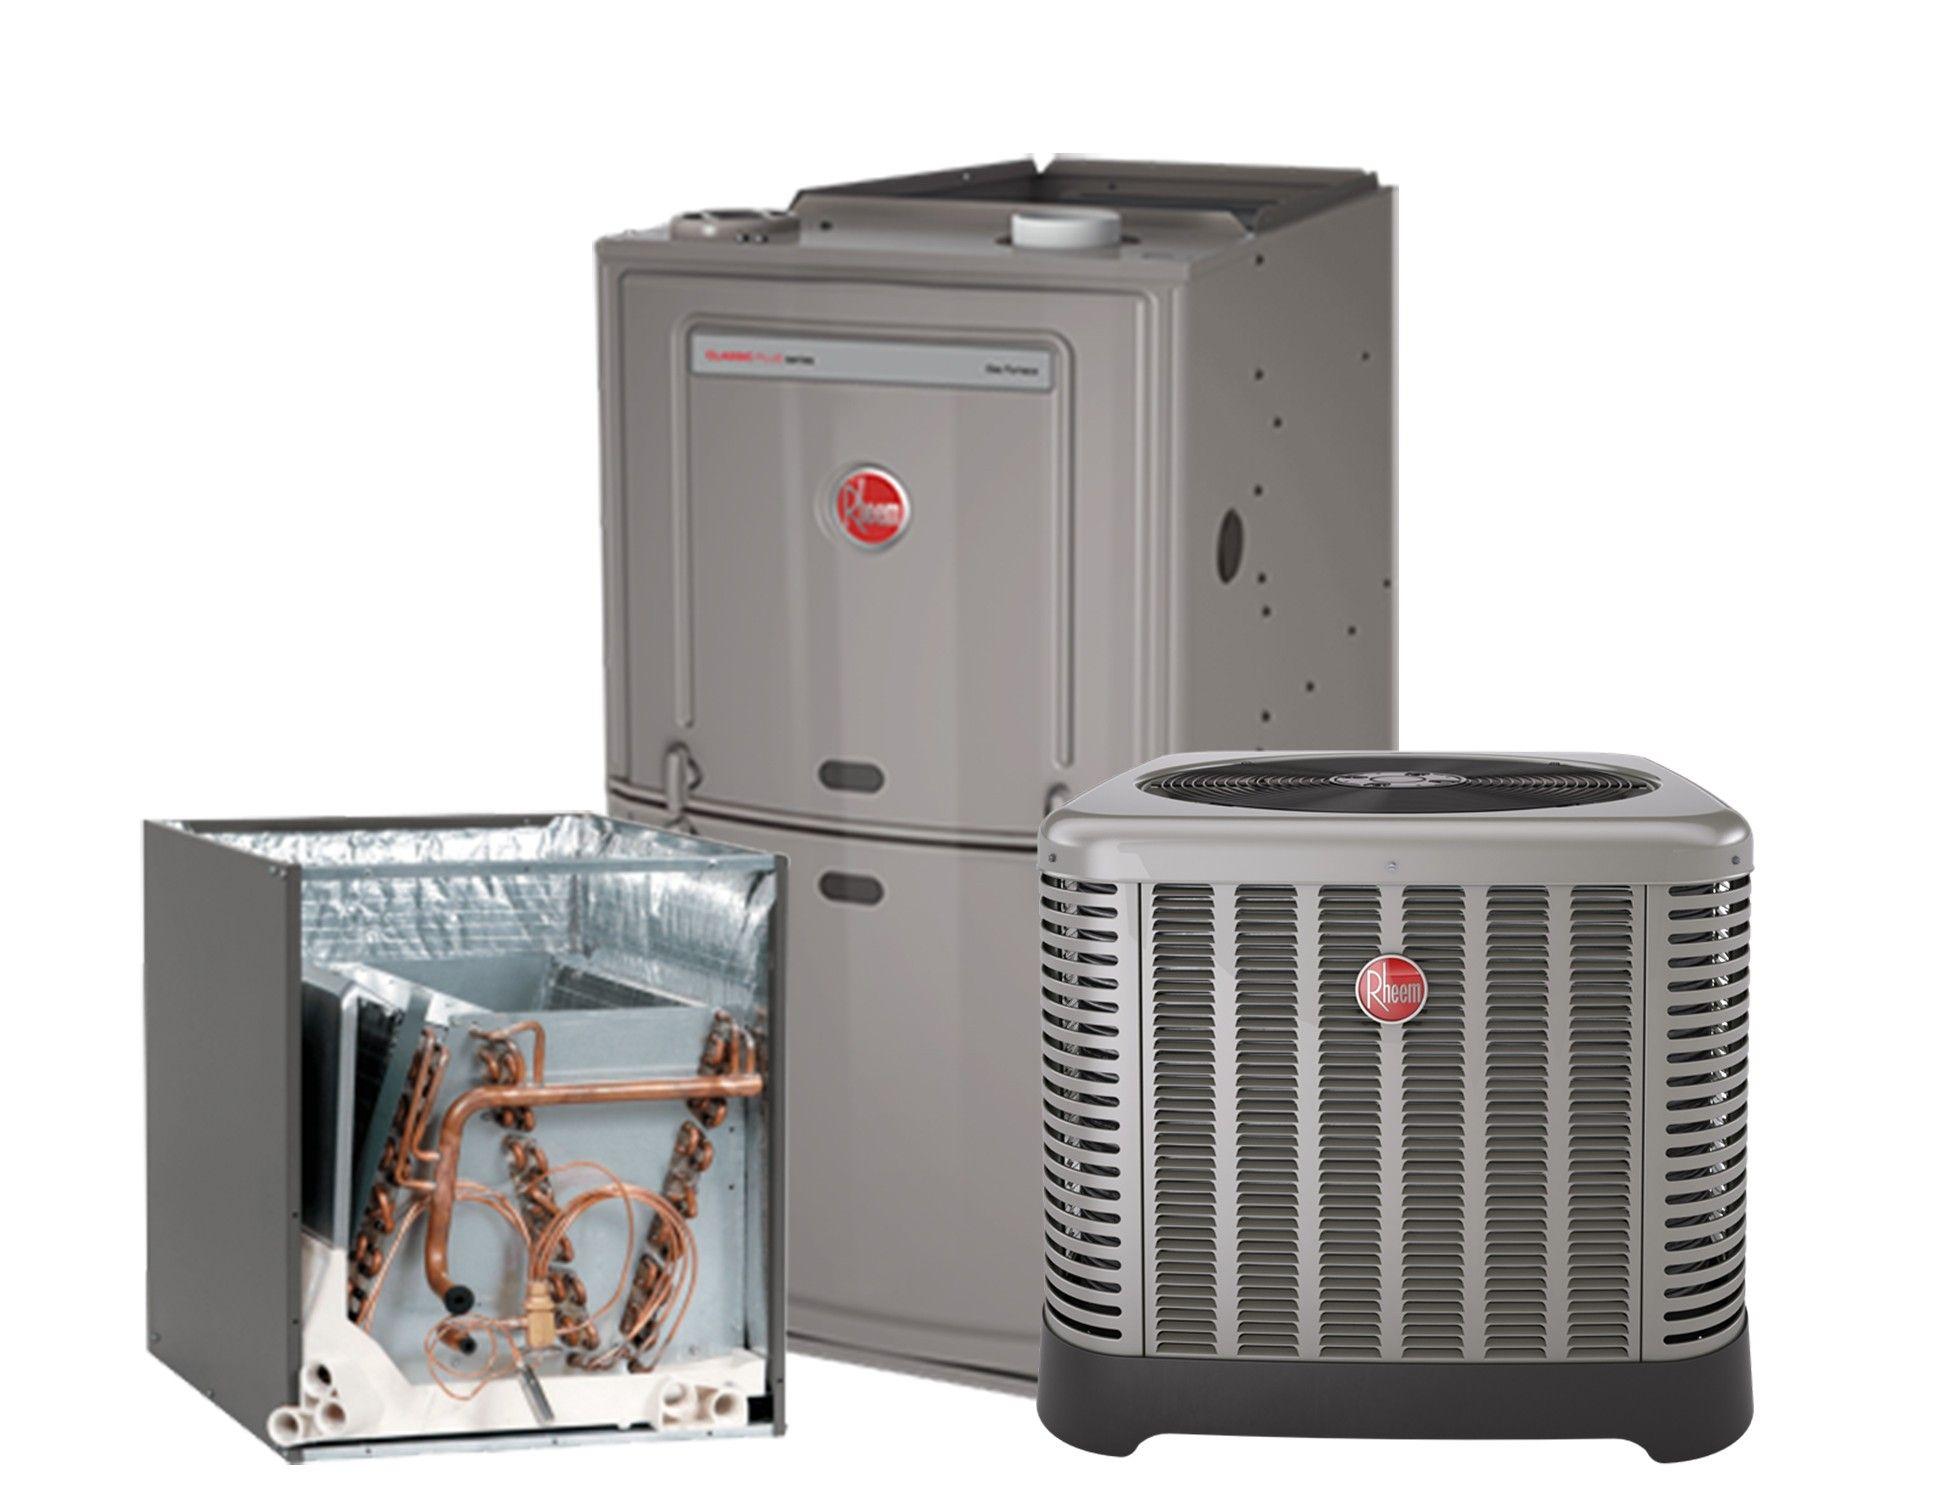 Rheem 2.0 Ton 14 SEER AC system with 80% 50K BTU Natural